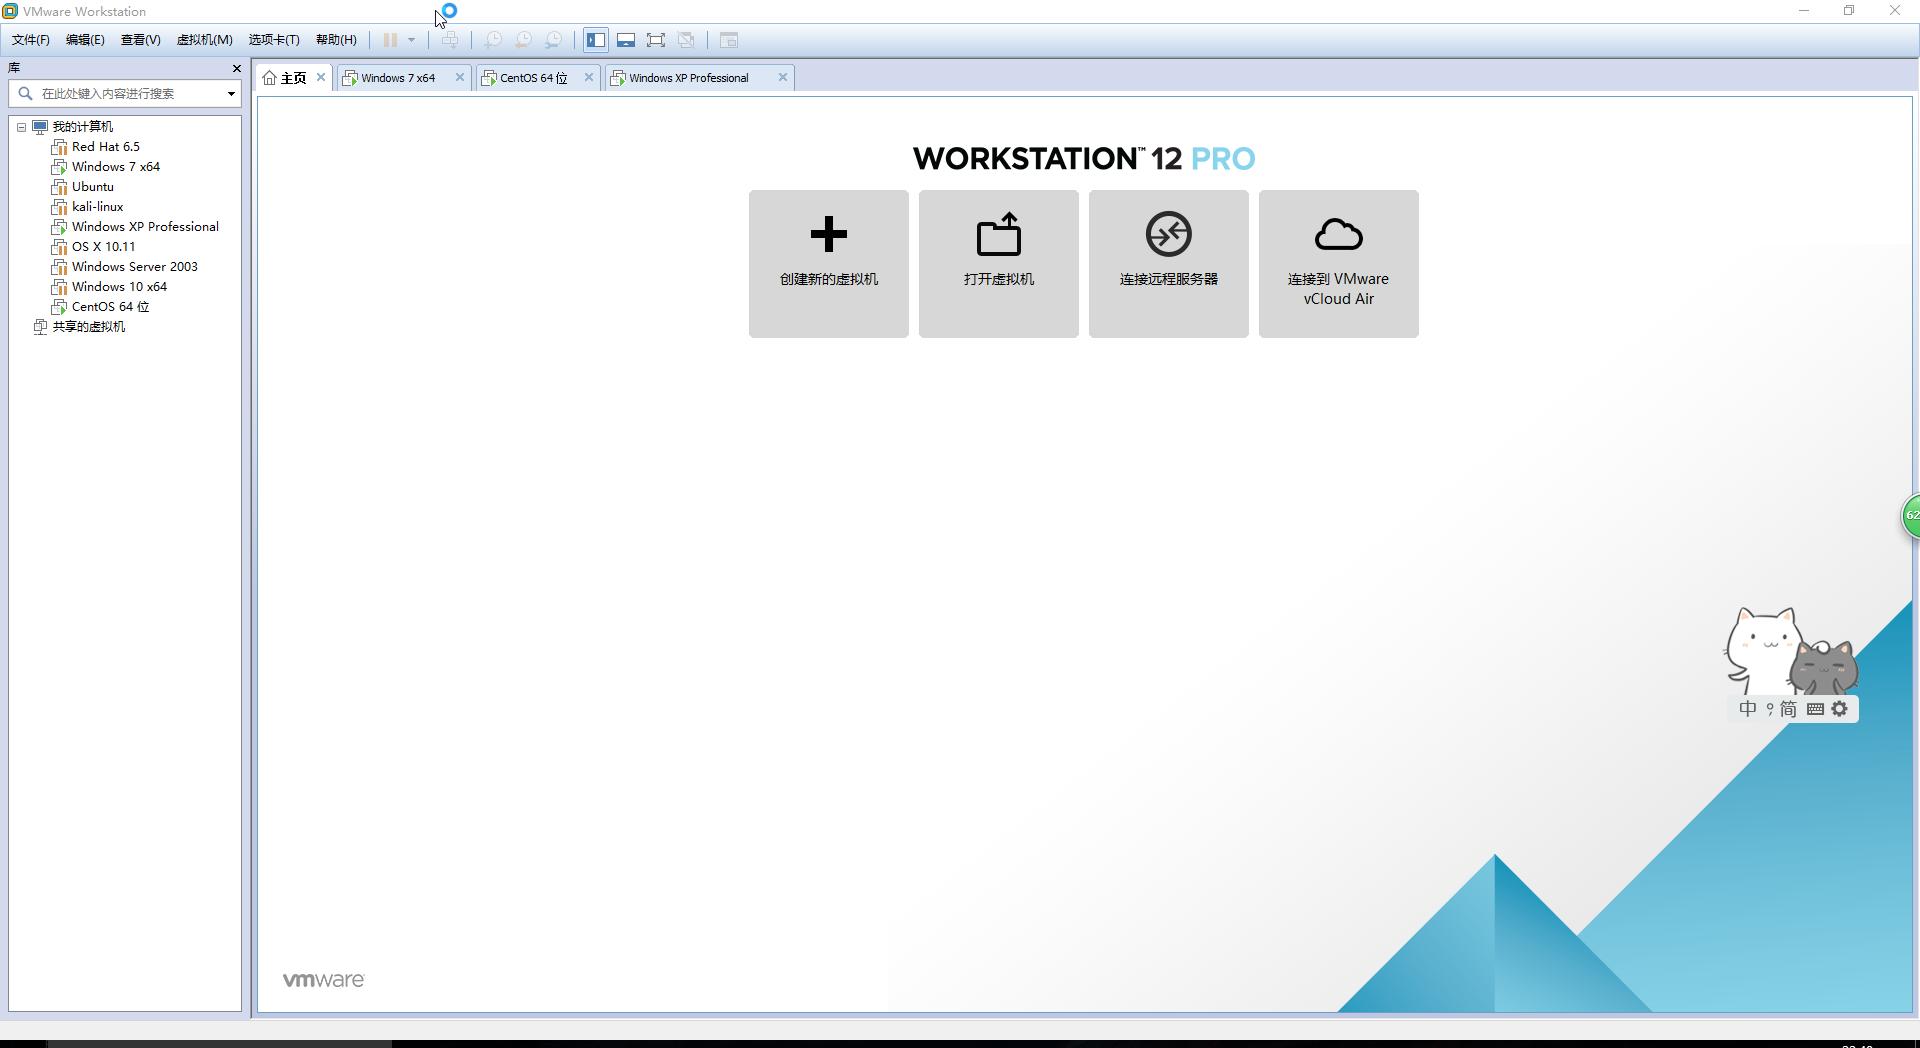 VMware12.5程序(虚拟机)